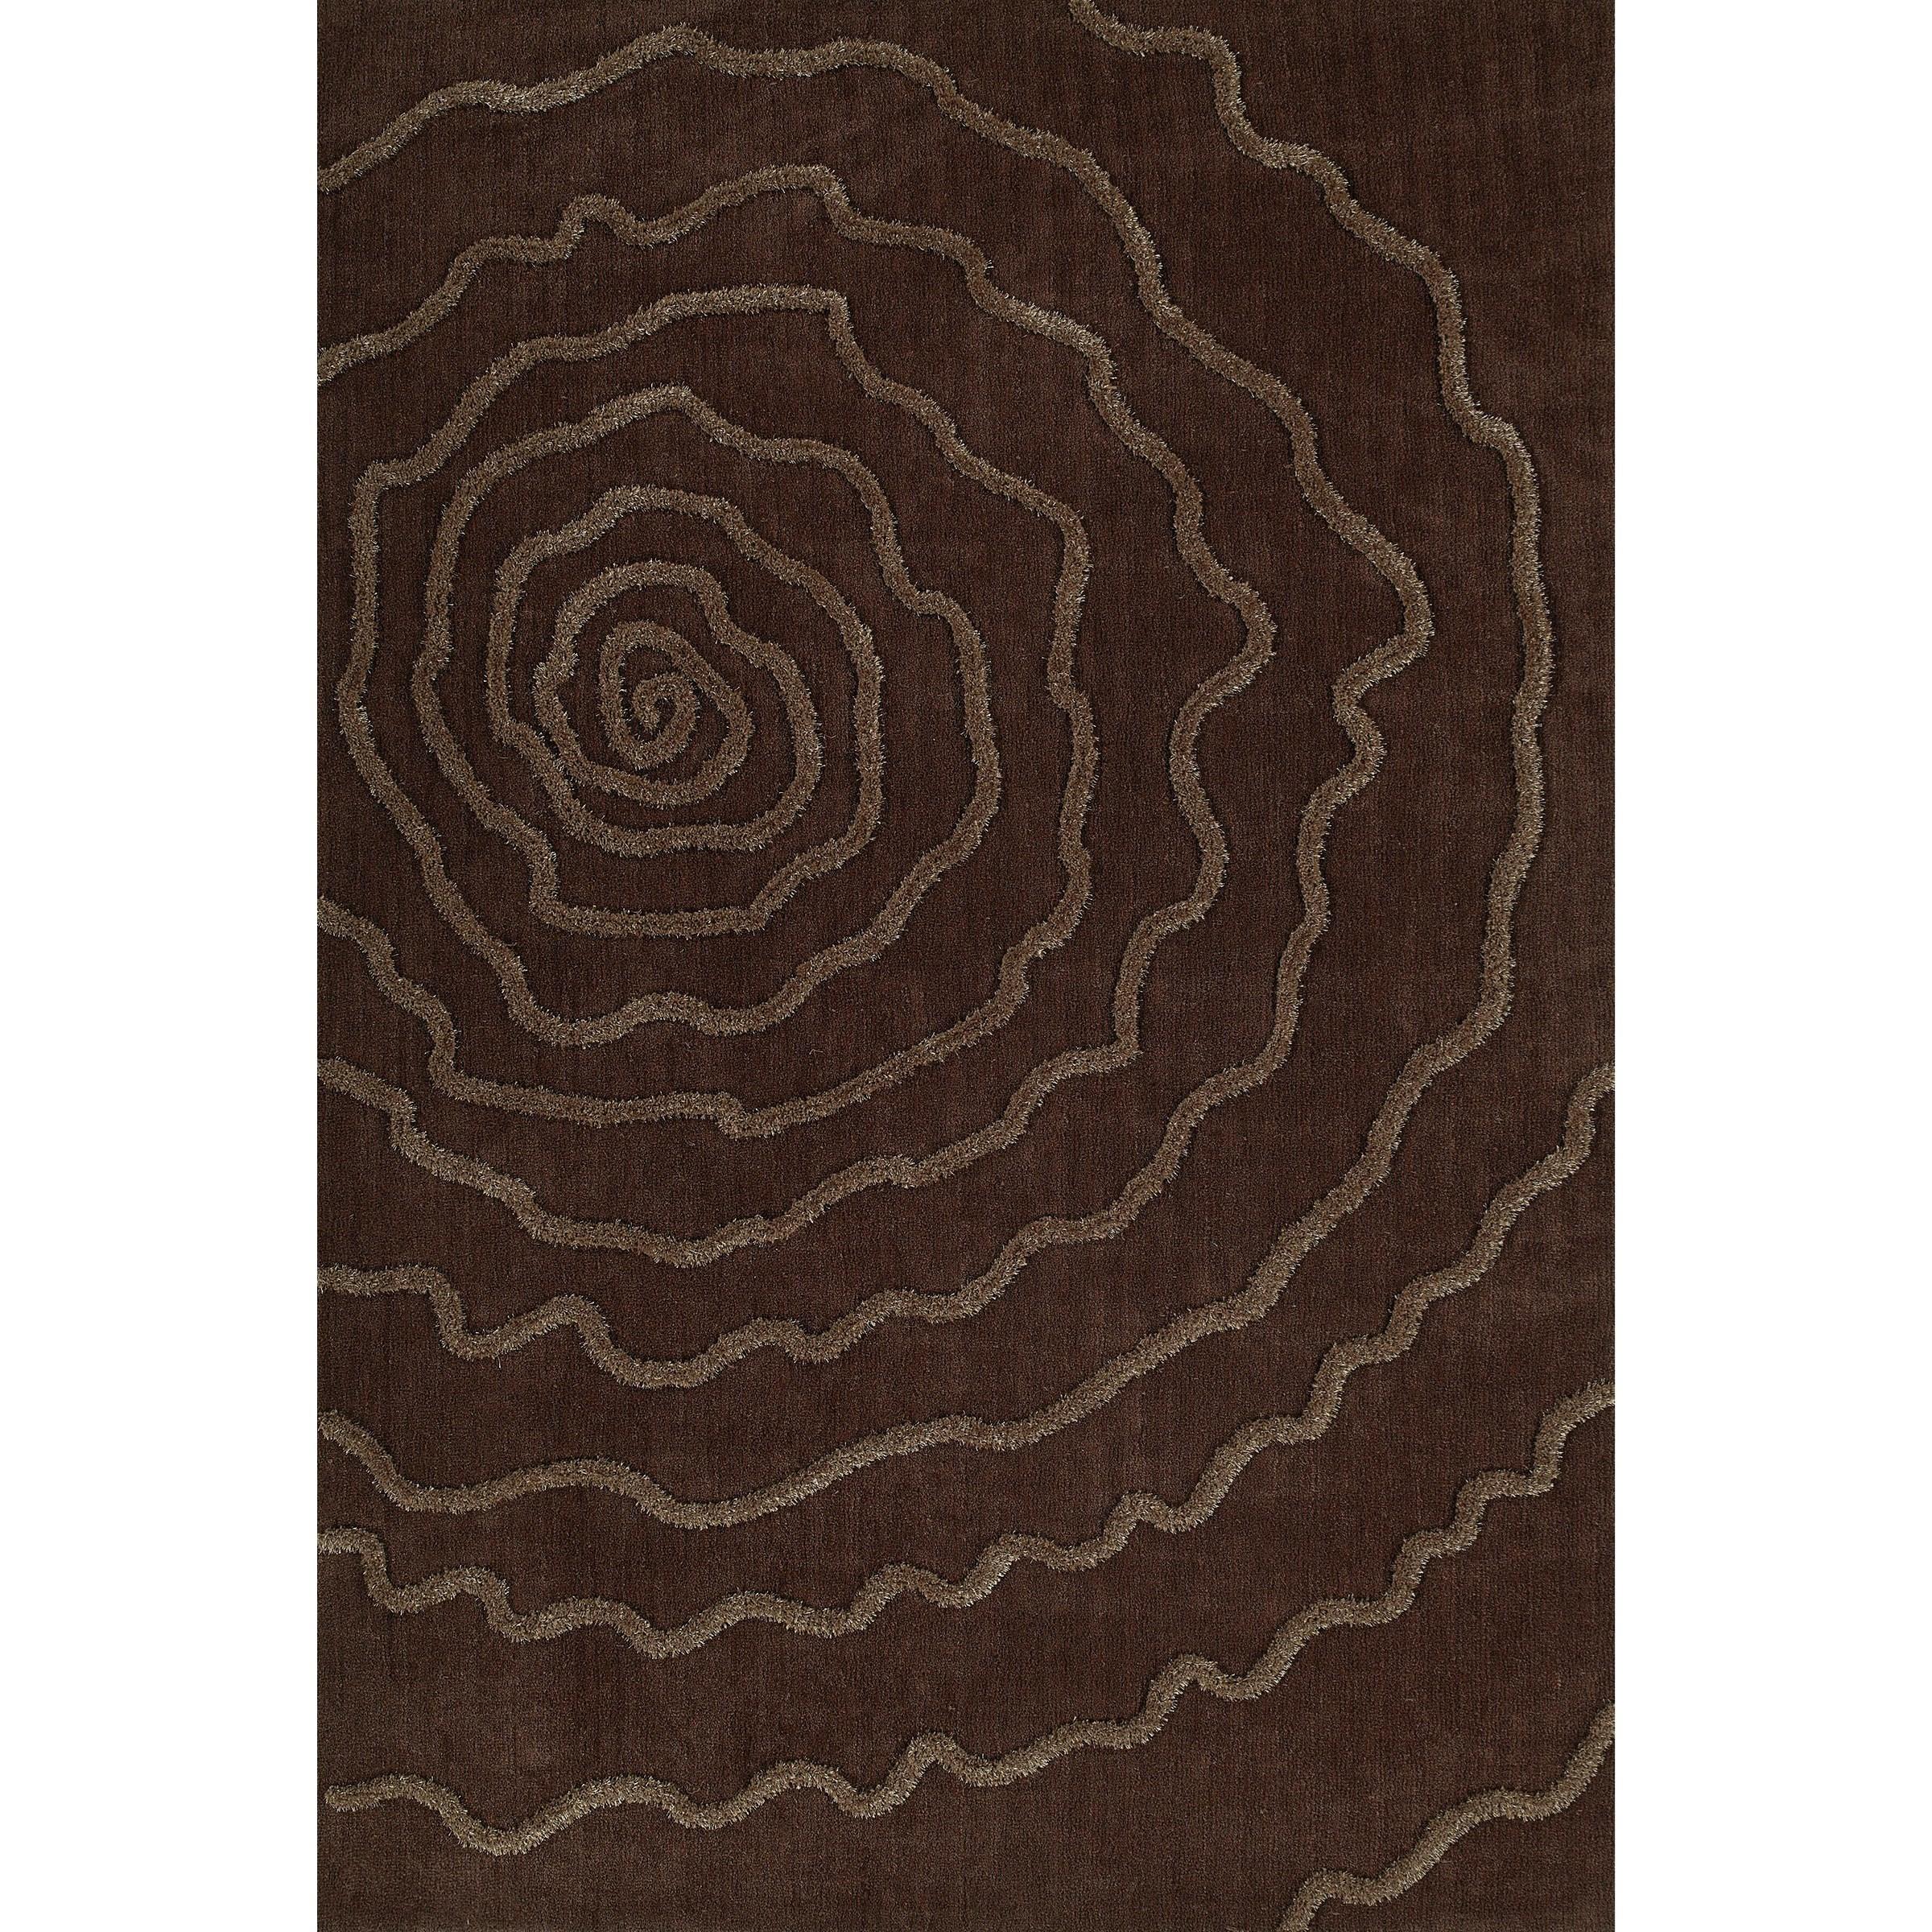 "Dakota Chocolate 5'X7'6"" Area Rug by Dalyn at Fashion Furniture"